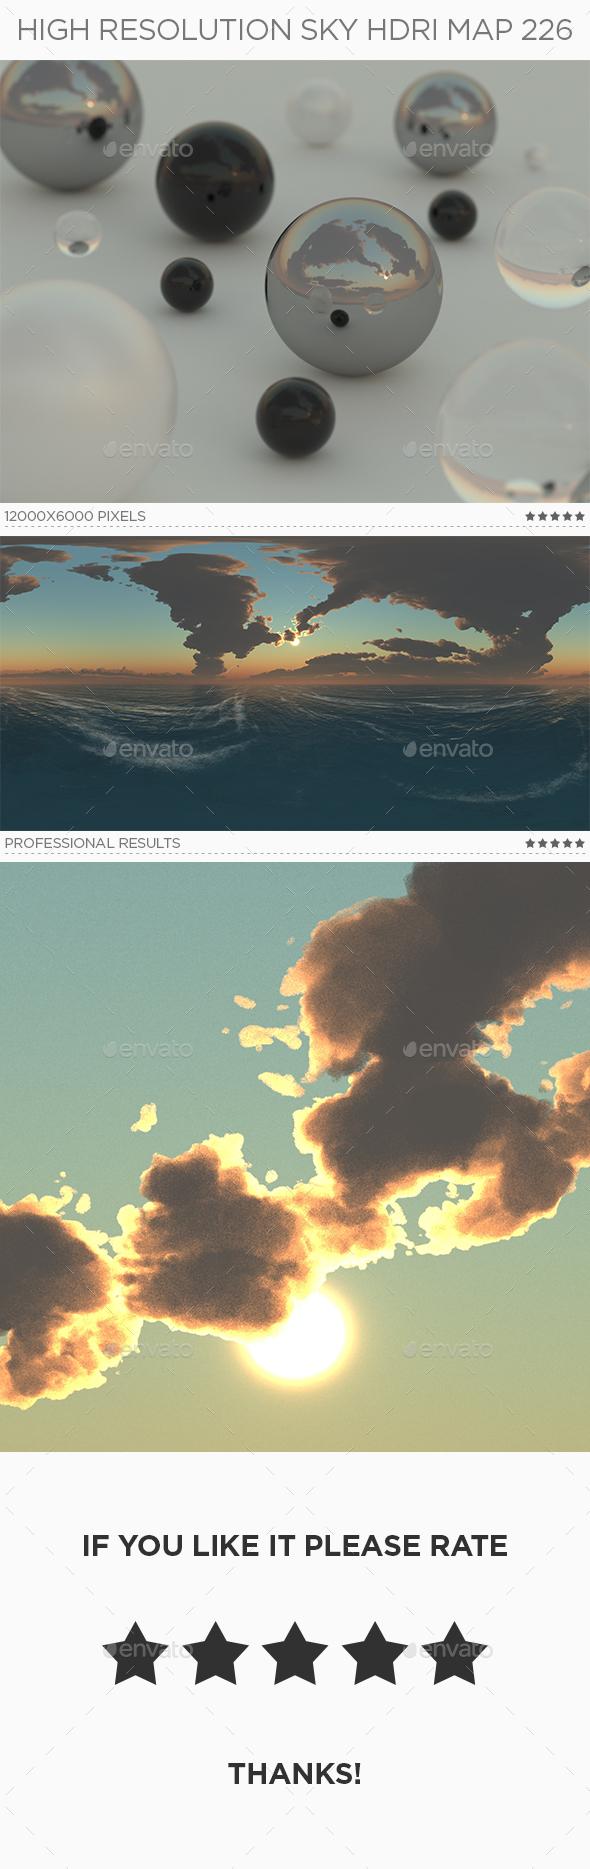 High Resolution Sky HDRi Map 226 - 3DOcean Item for Sale